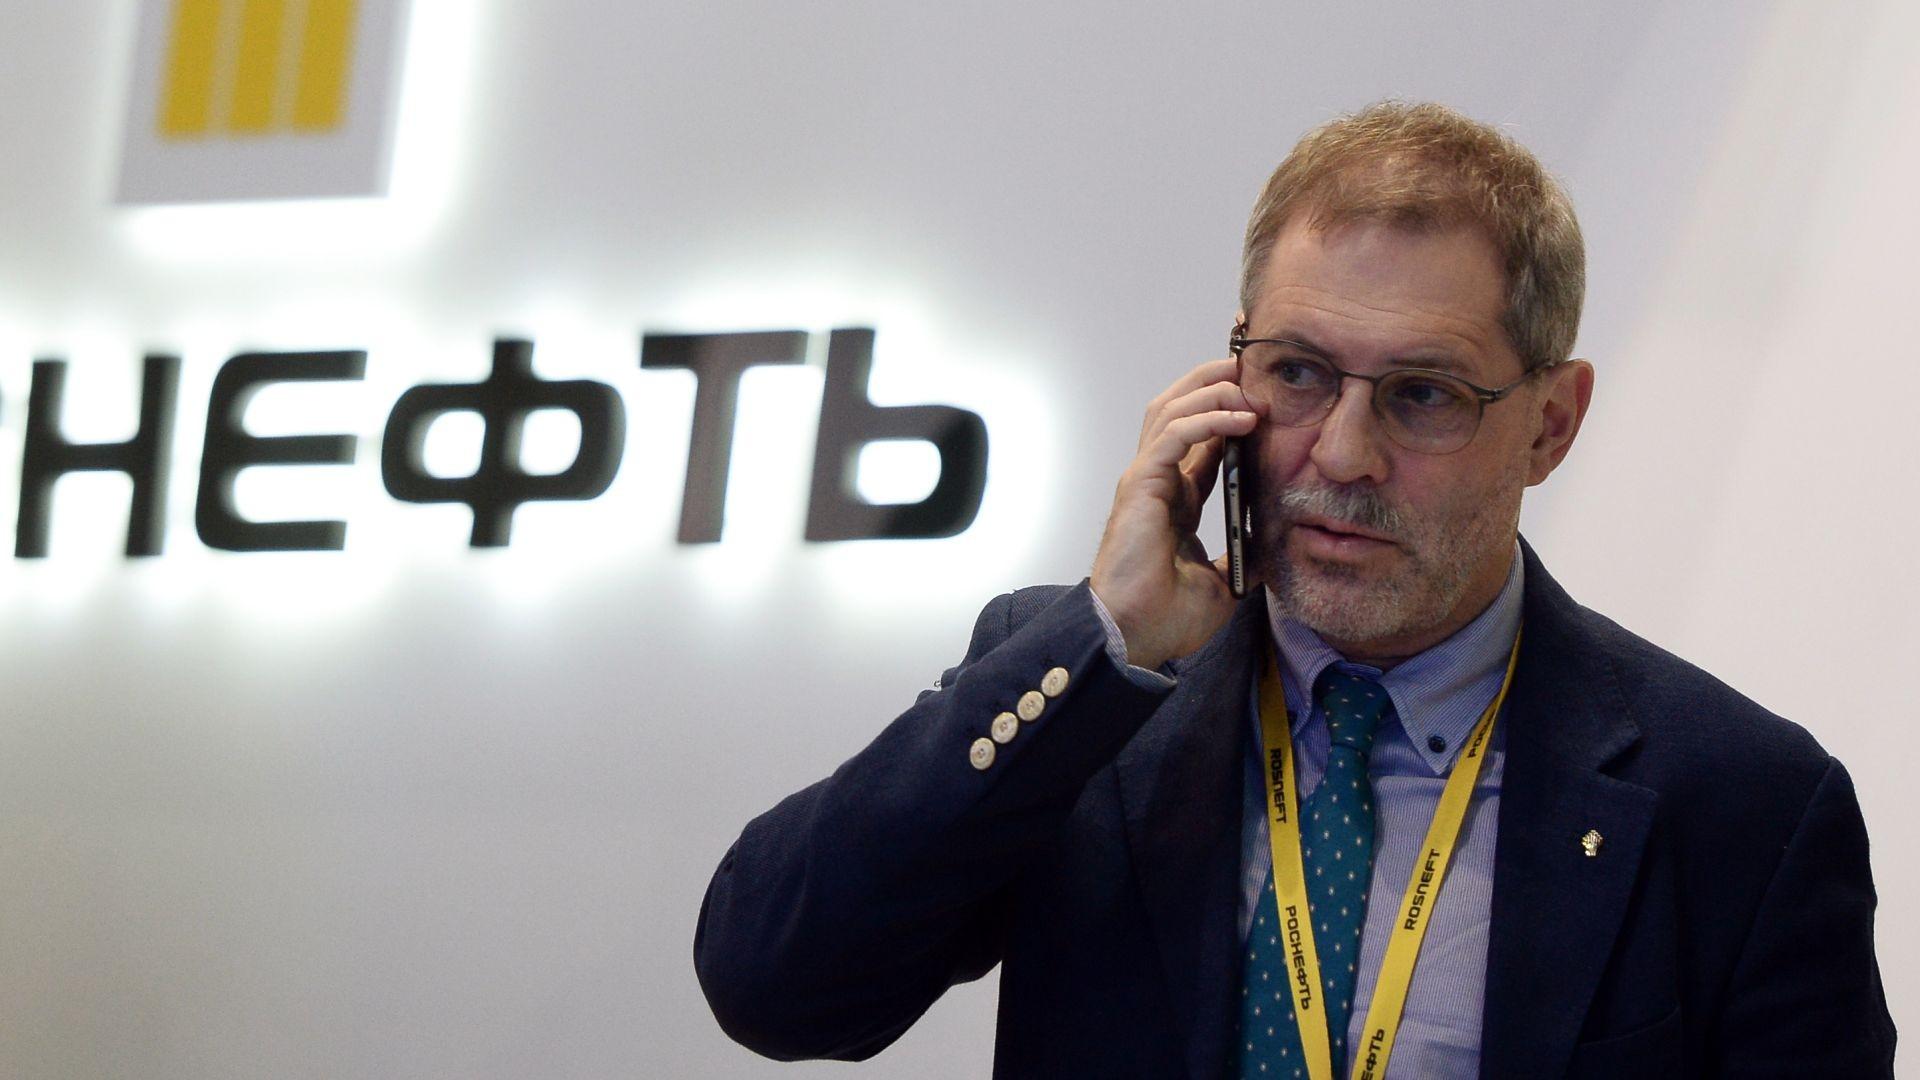 <p>Фото: &copy;РИА Новости/Максим Блинов</p>